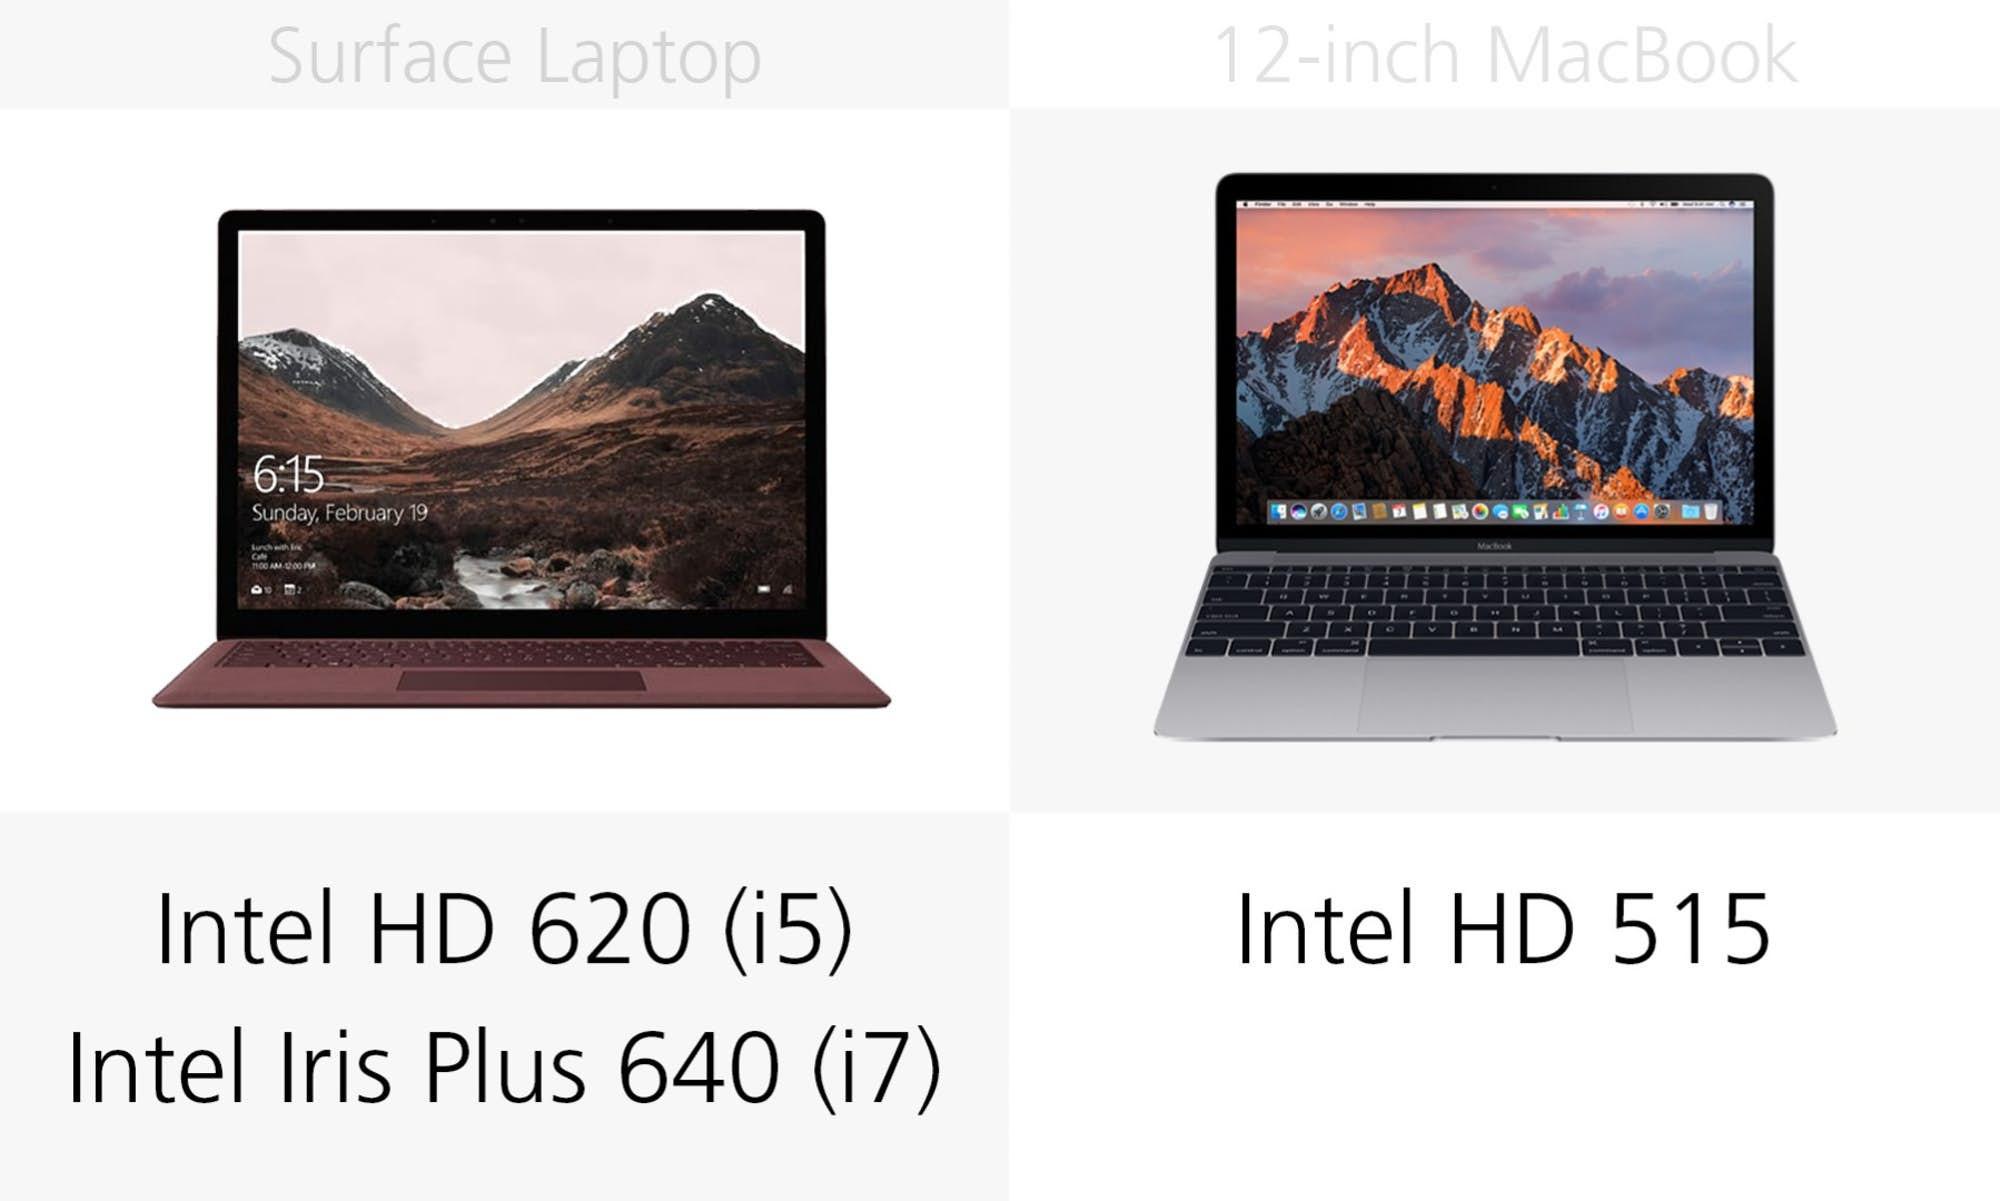 1493888136_apple-macbook-vs-microsoft-surface-laptop-14.jpg